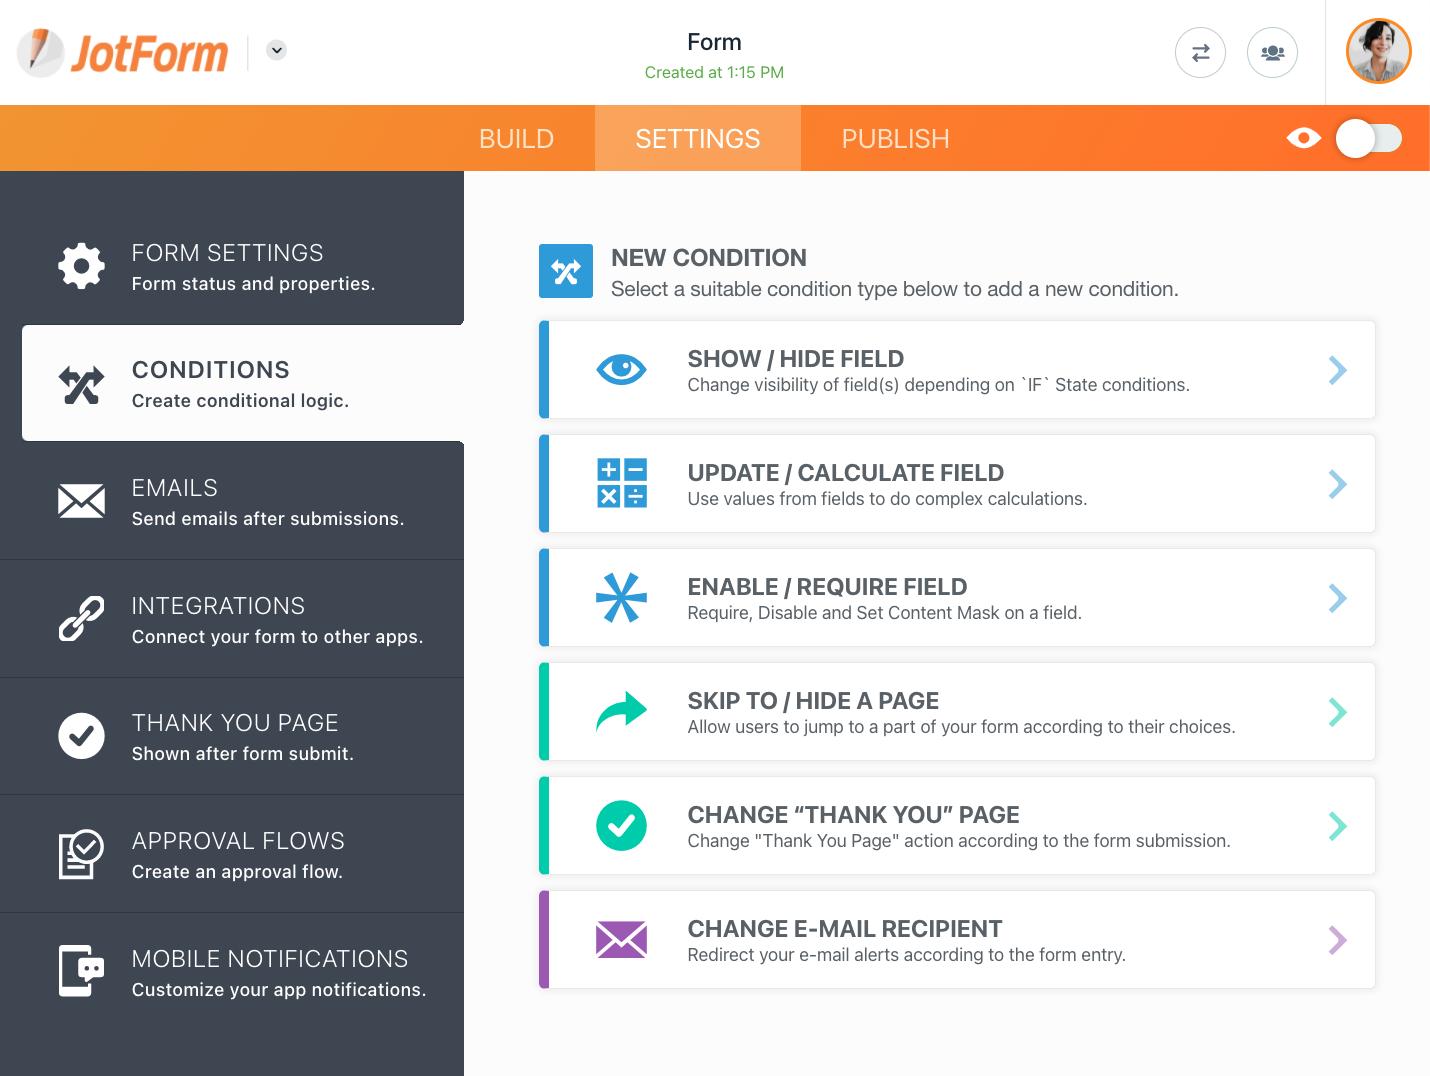 JotForm Smart Forms: Conditional Logic